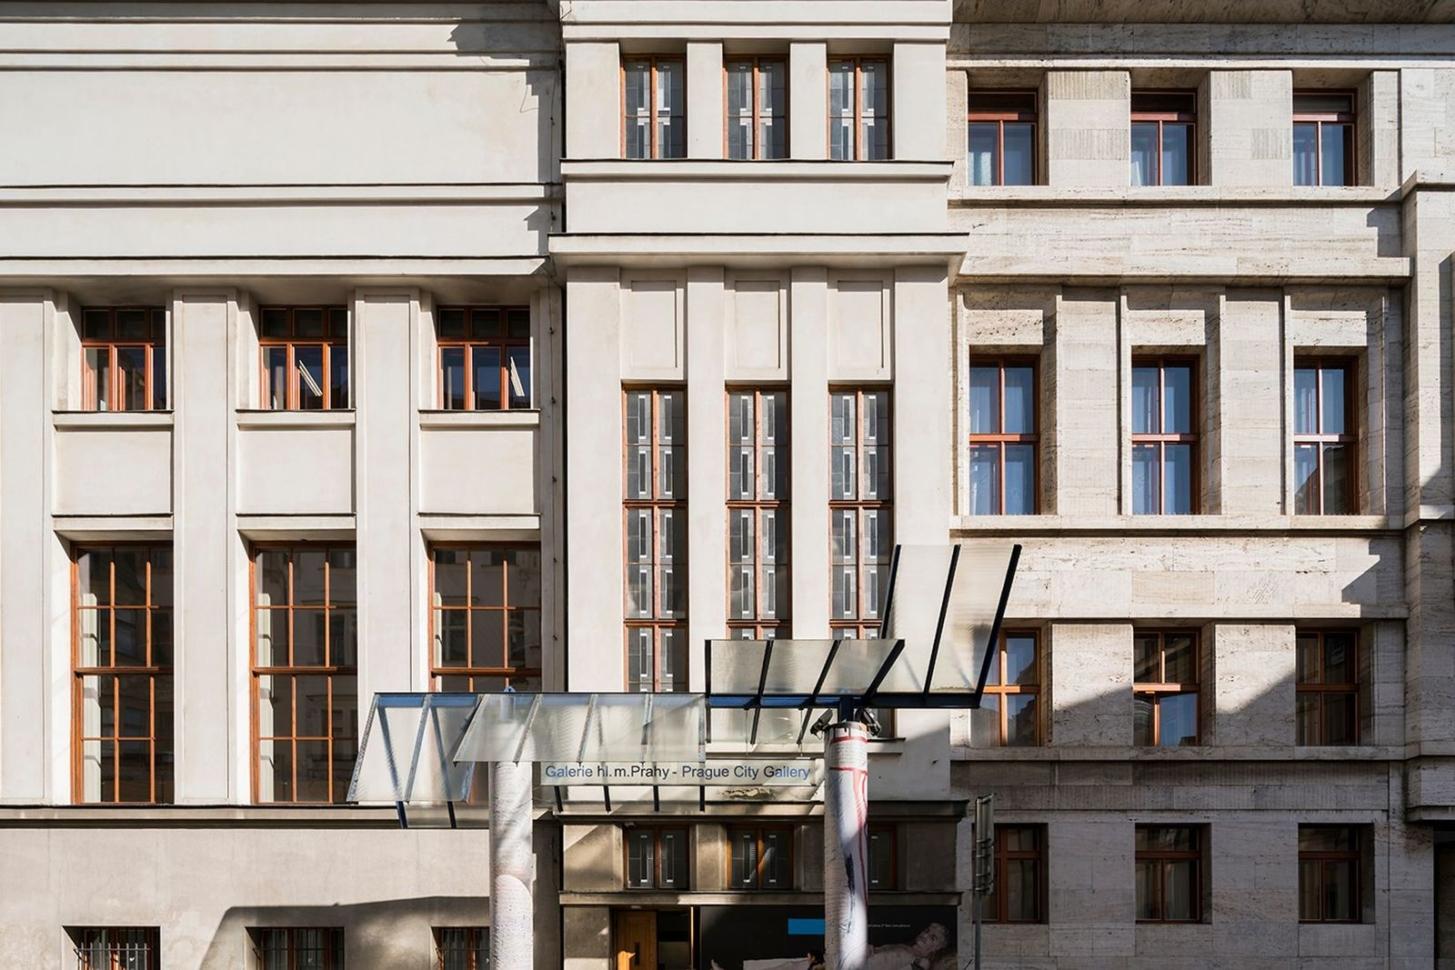 Municipal Library of Prague, 2nd floor . Photo by Studio Flusser